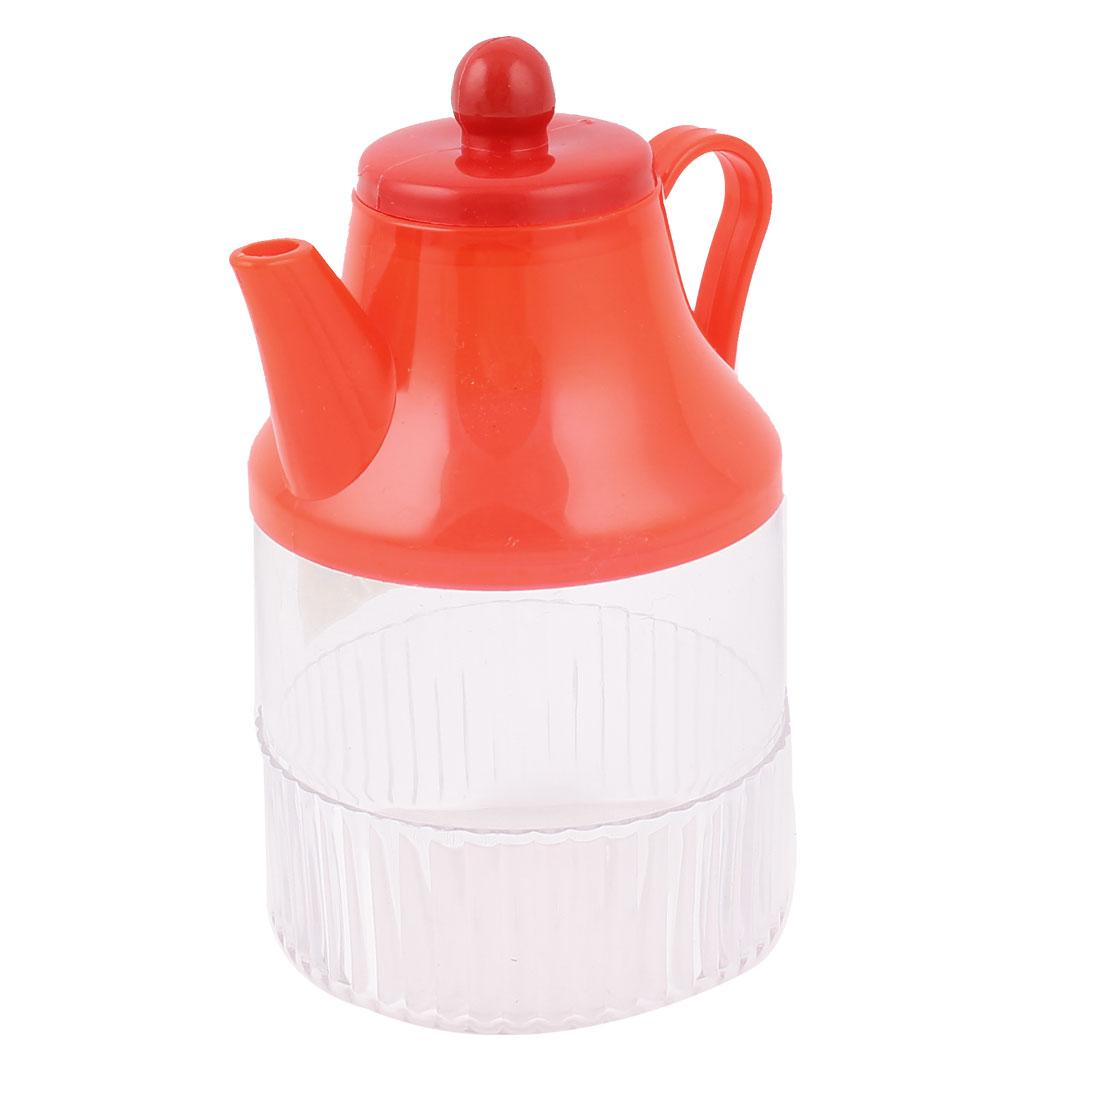 Kitchenware Red Clear Plastic Oil Flavoring Cruet Bottle Holder 400ml